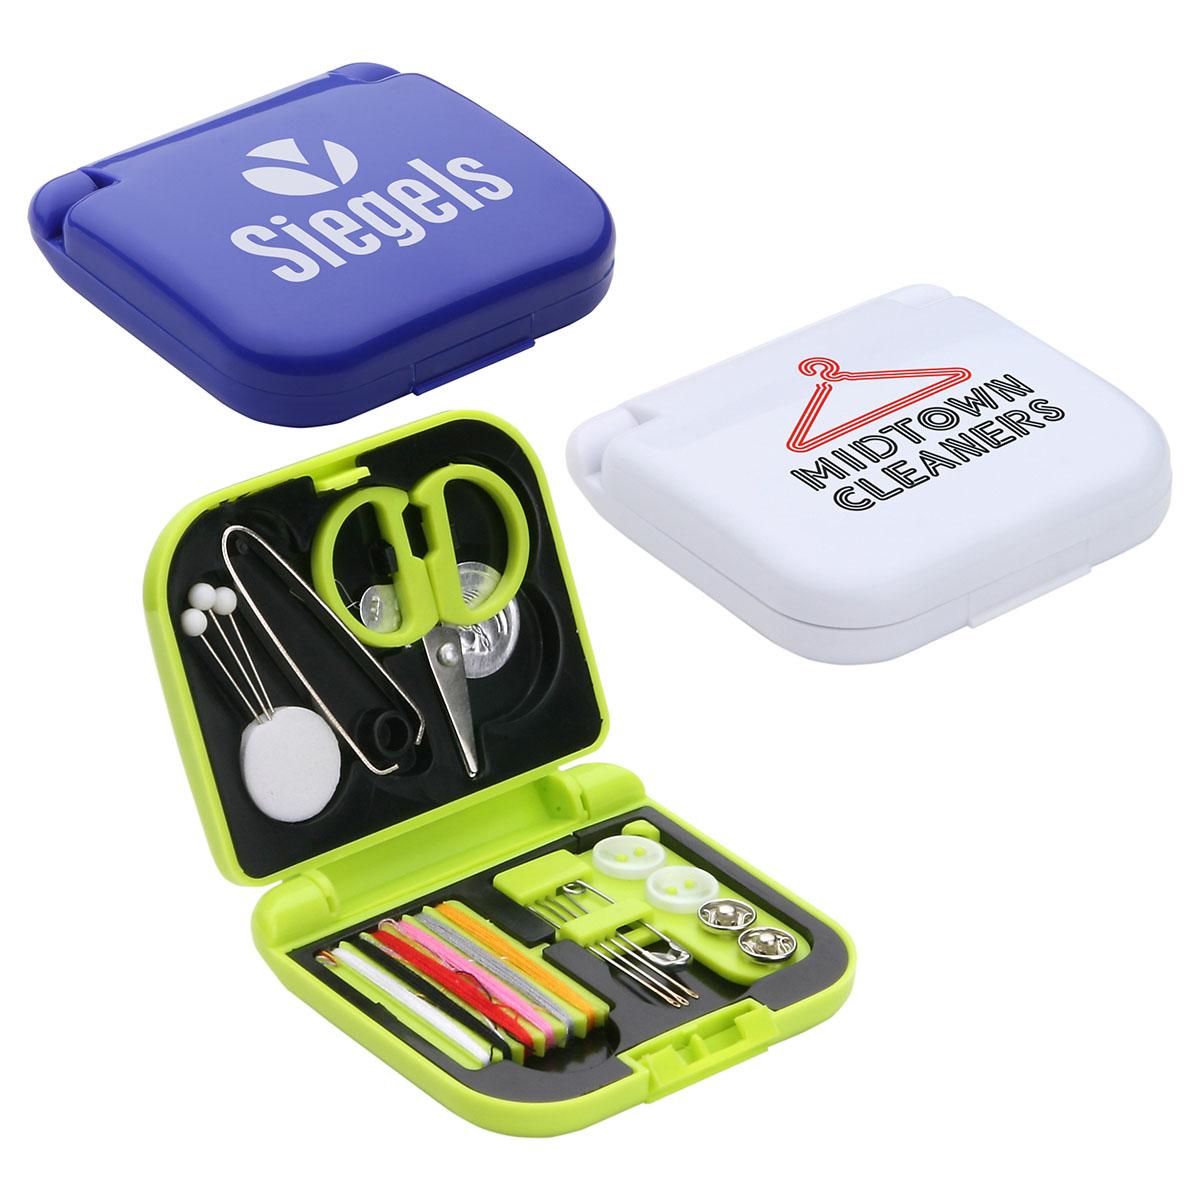 Travel Sewing Kit, WTV-SK08 - 1 Colour Imprint